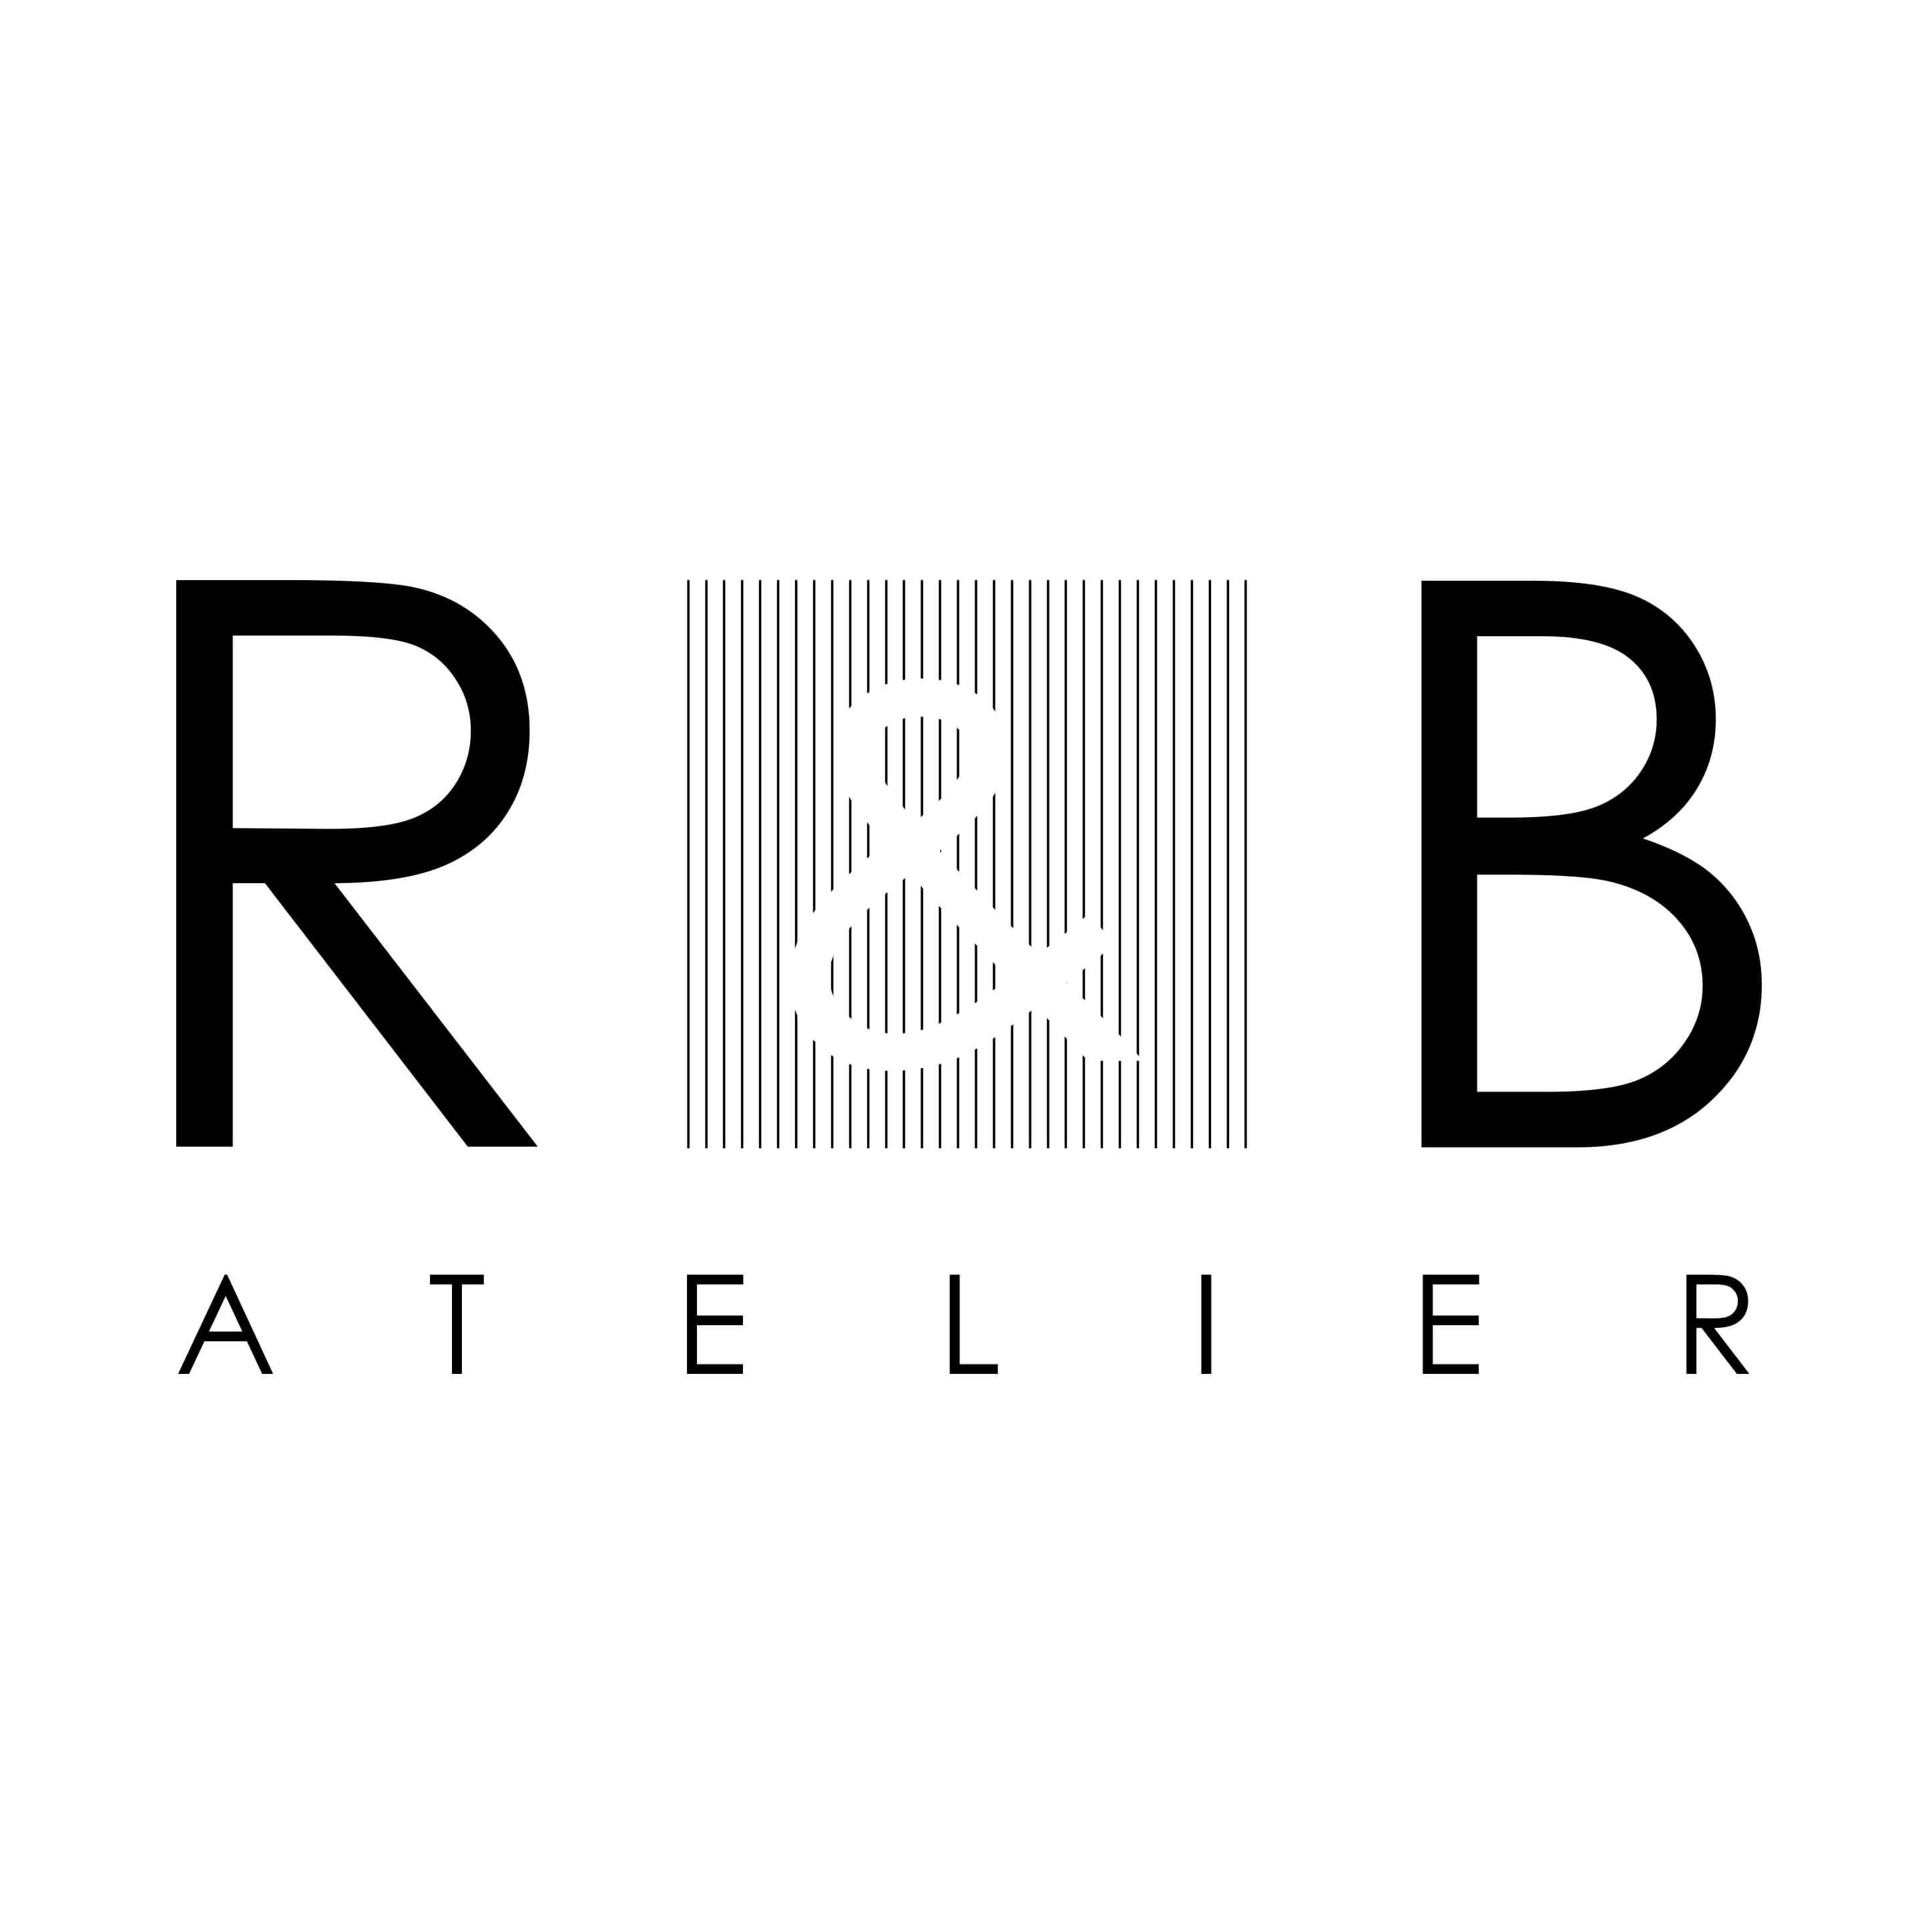 Atelier R&B